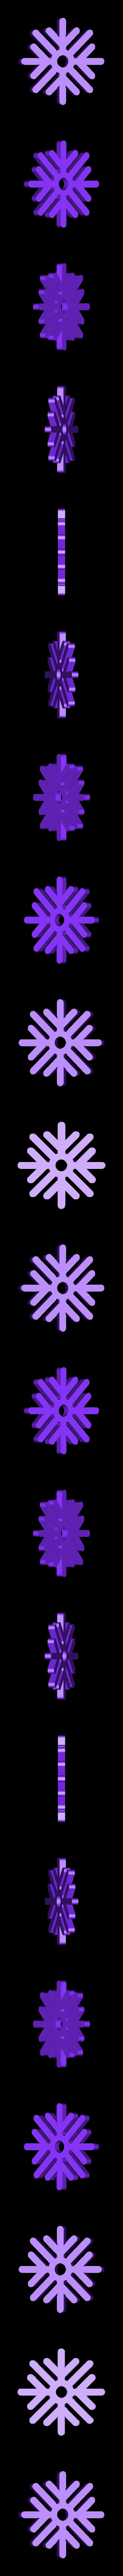 DiY_Christmas_Tree_-_Branch_7_CSD.stl Download free STL file Christmas Tree - DiY (printable) • Object to 3D print, CSD_Salzburg